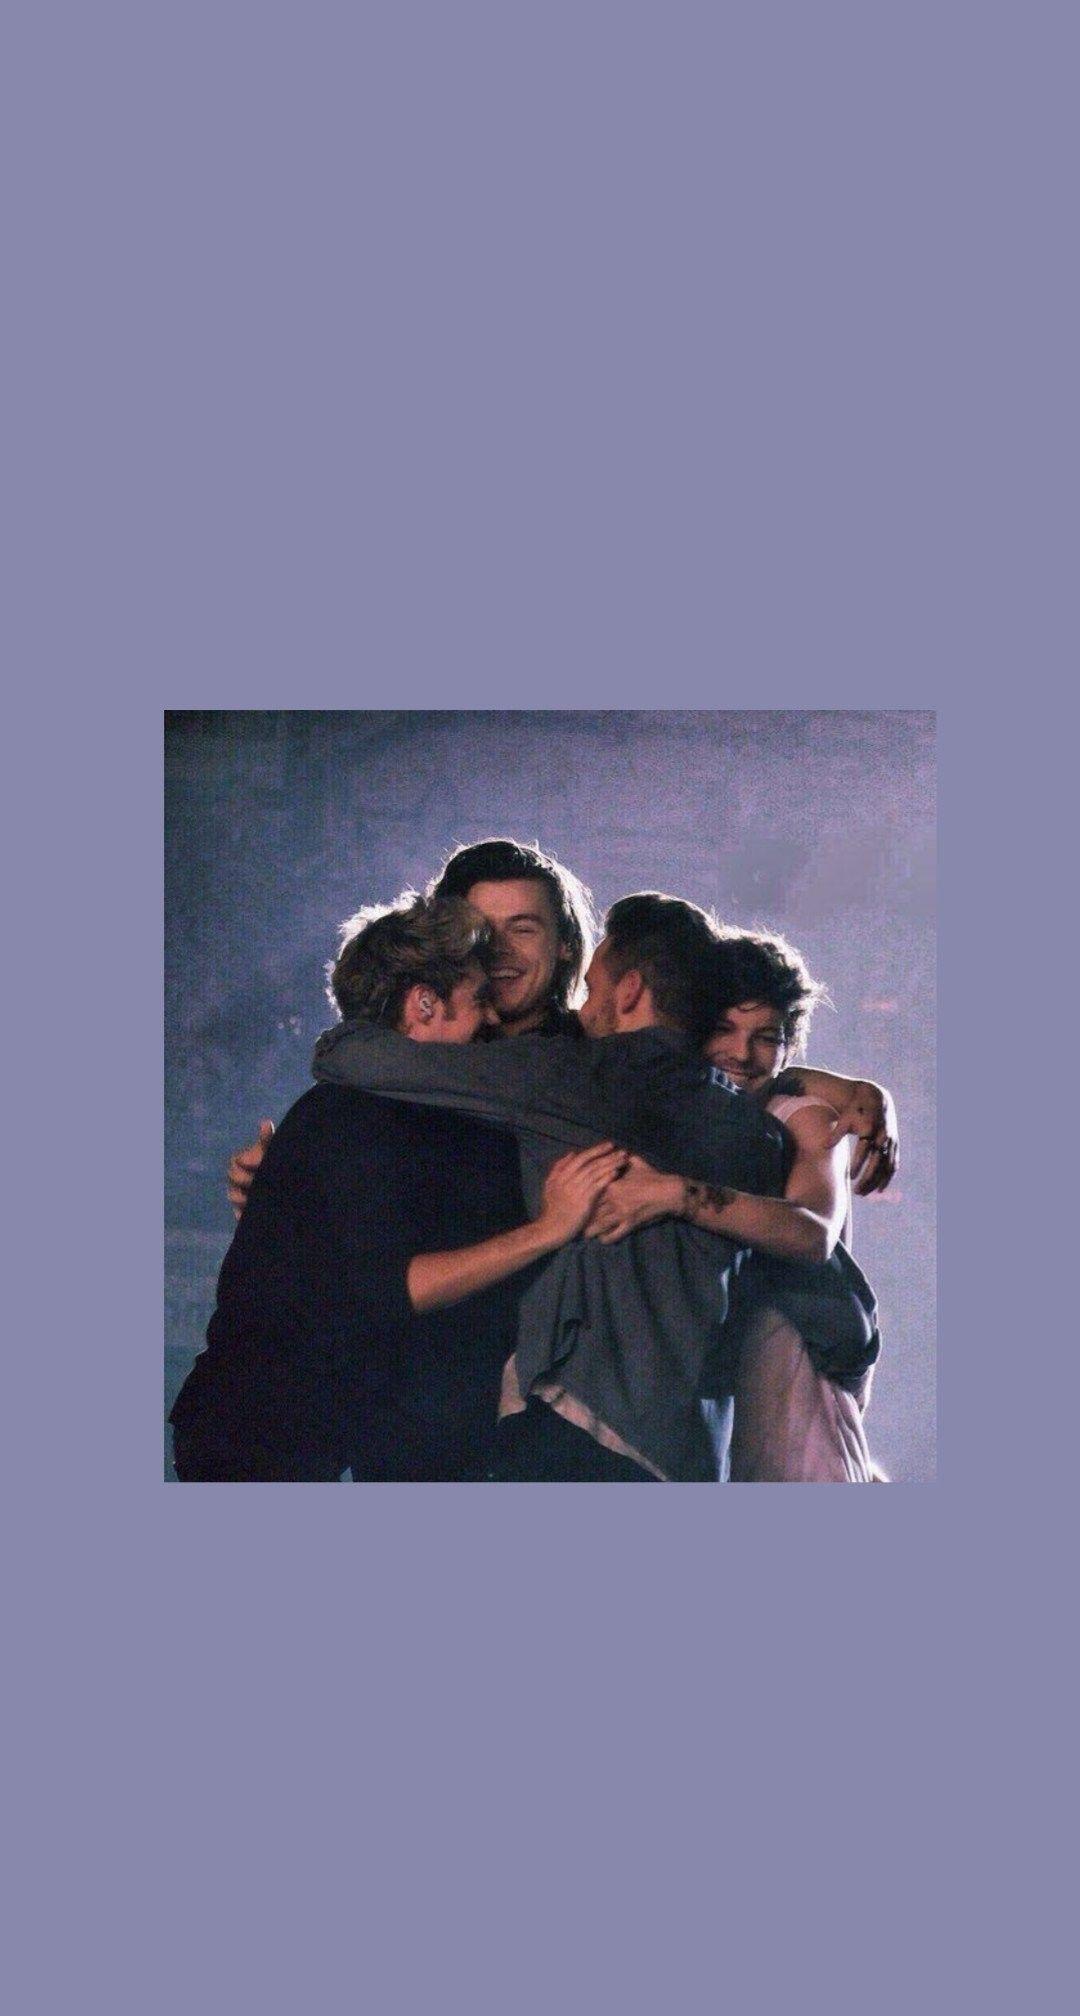 Ot5 Onedirectionbackground Tt Hazzymedicine Onedirectionbackground Ot5 Onedirection One Direction Wallpaper One Direction Background One Direction Pictures